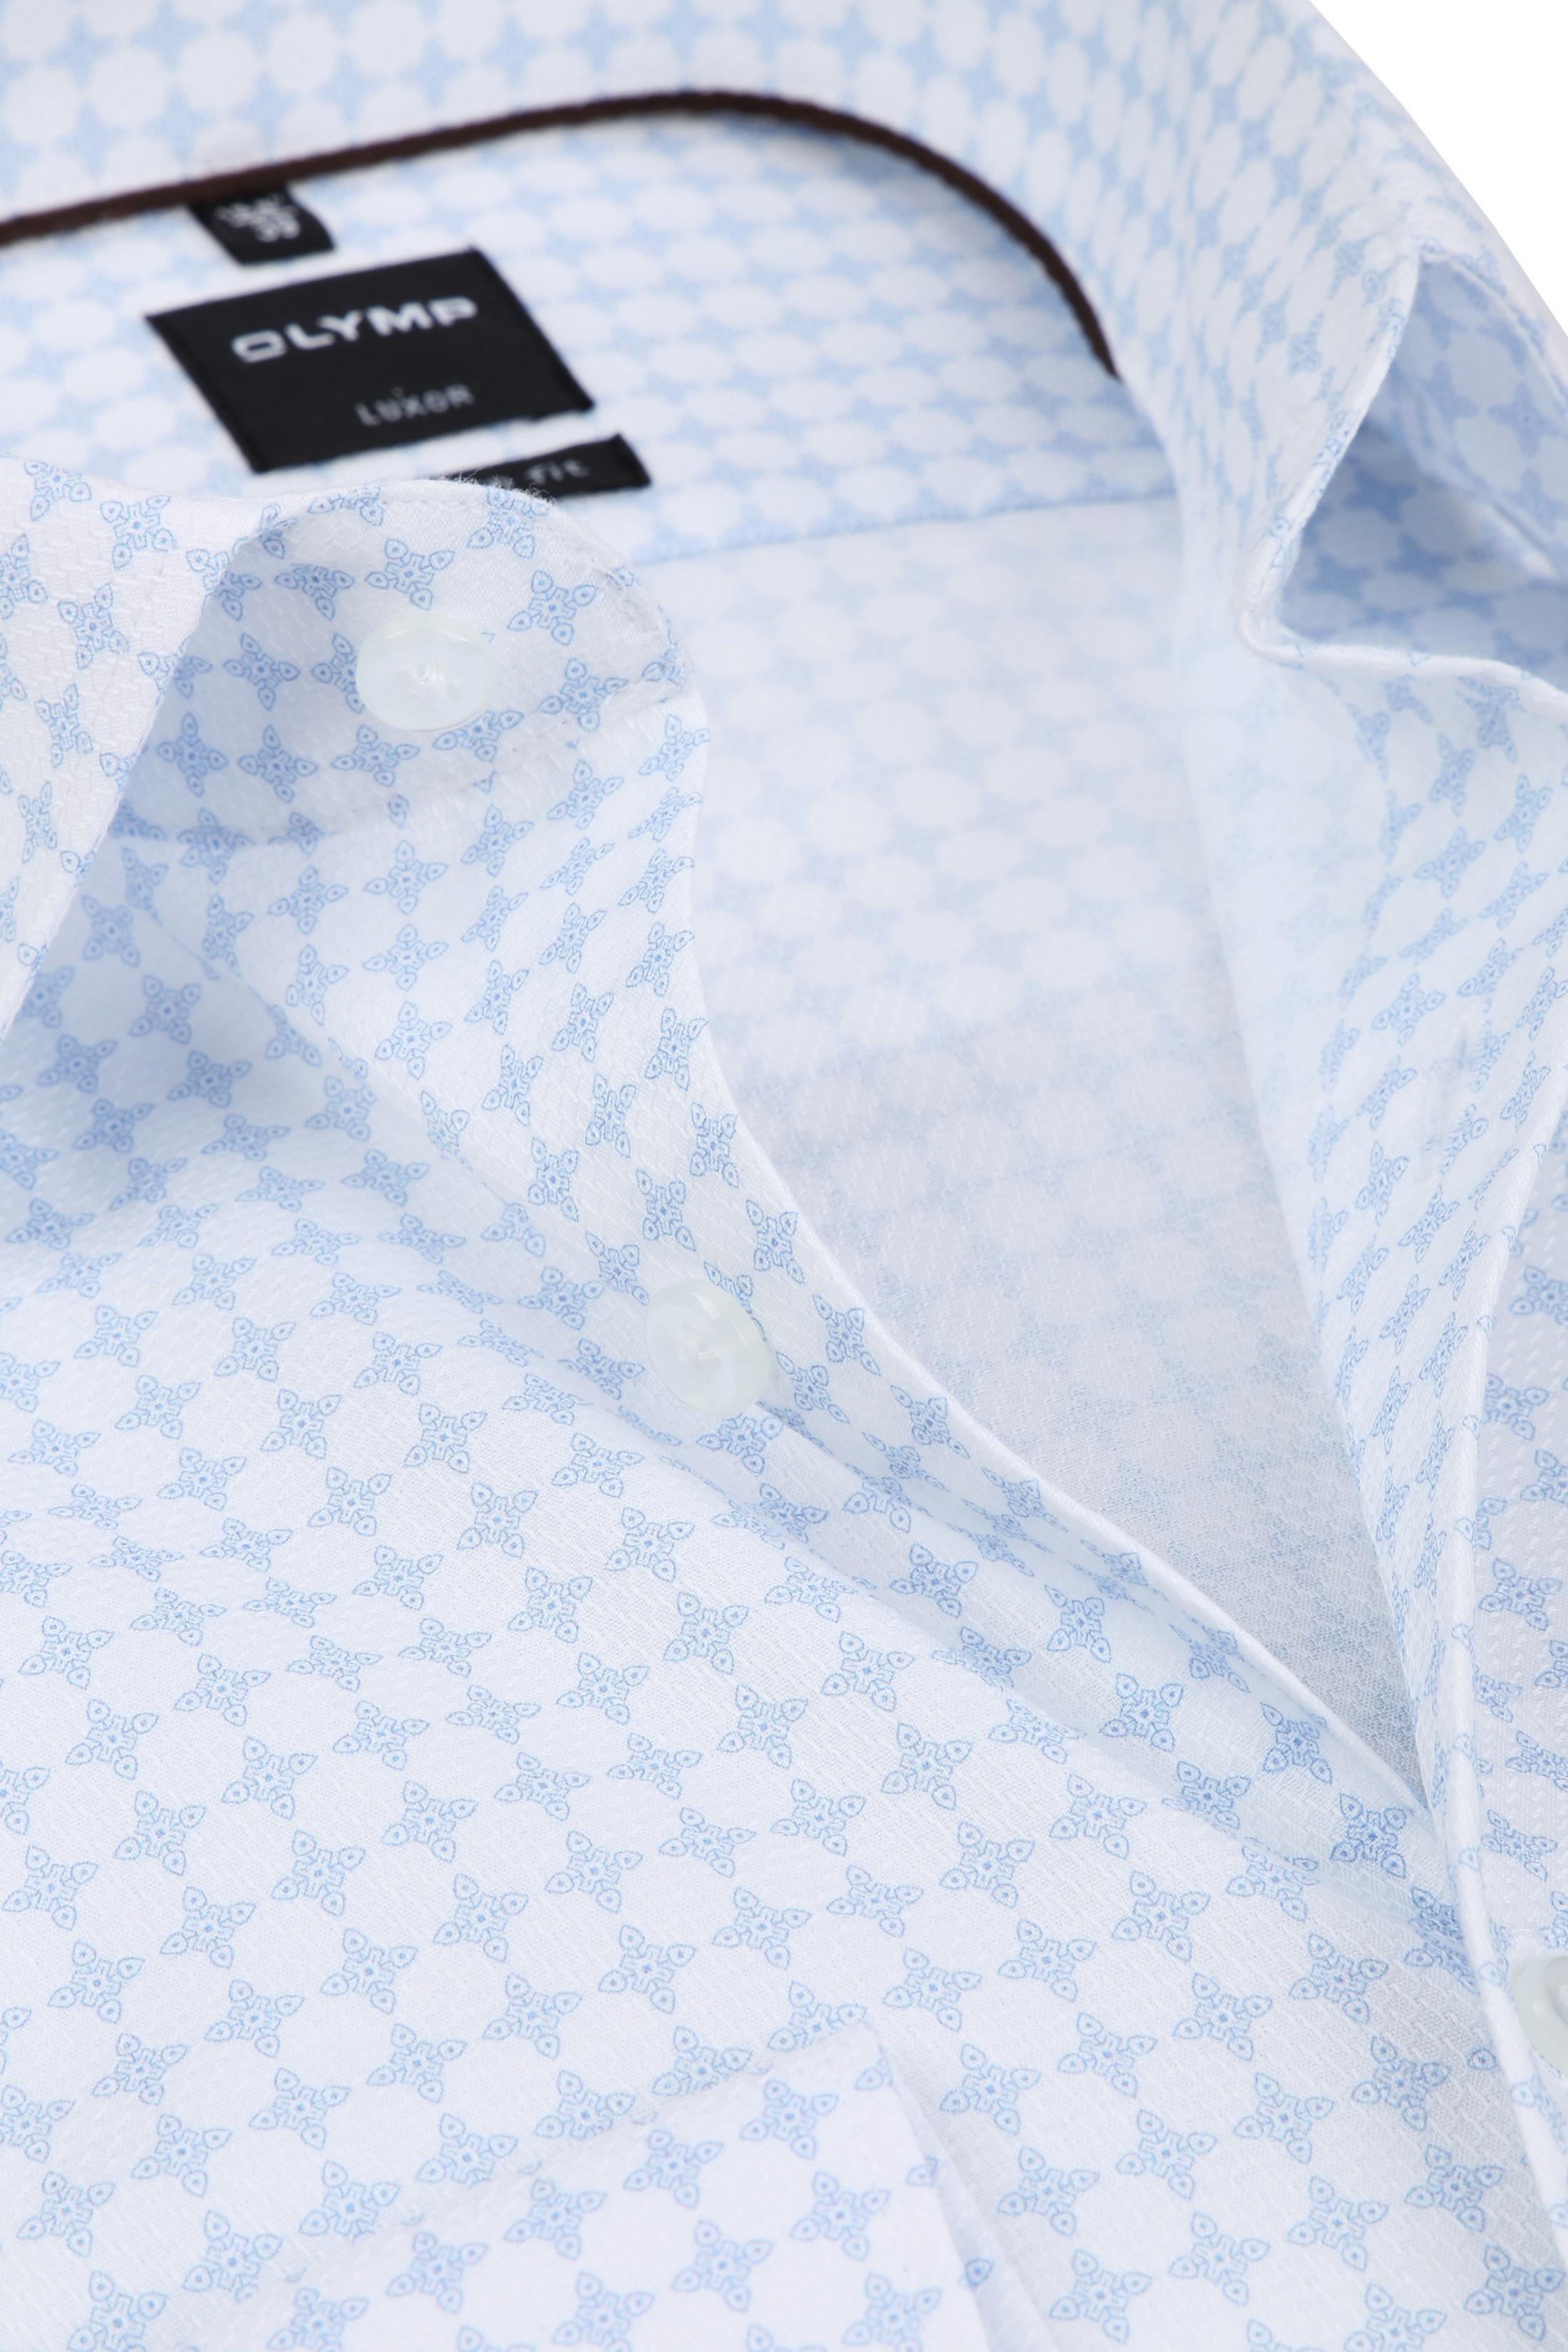 OLYMP Luxor Overhemd MF Lichtblauw SL7 foto 1